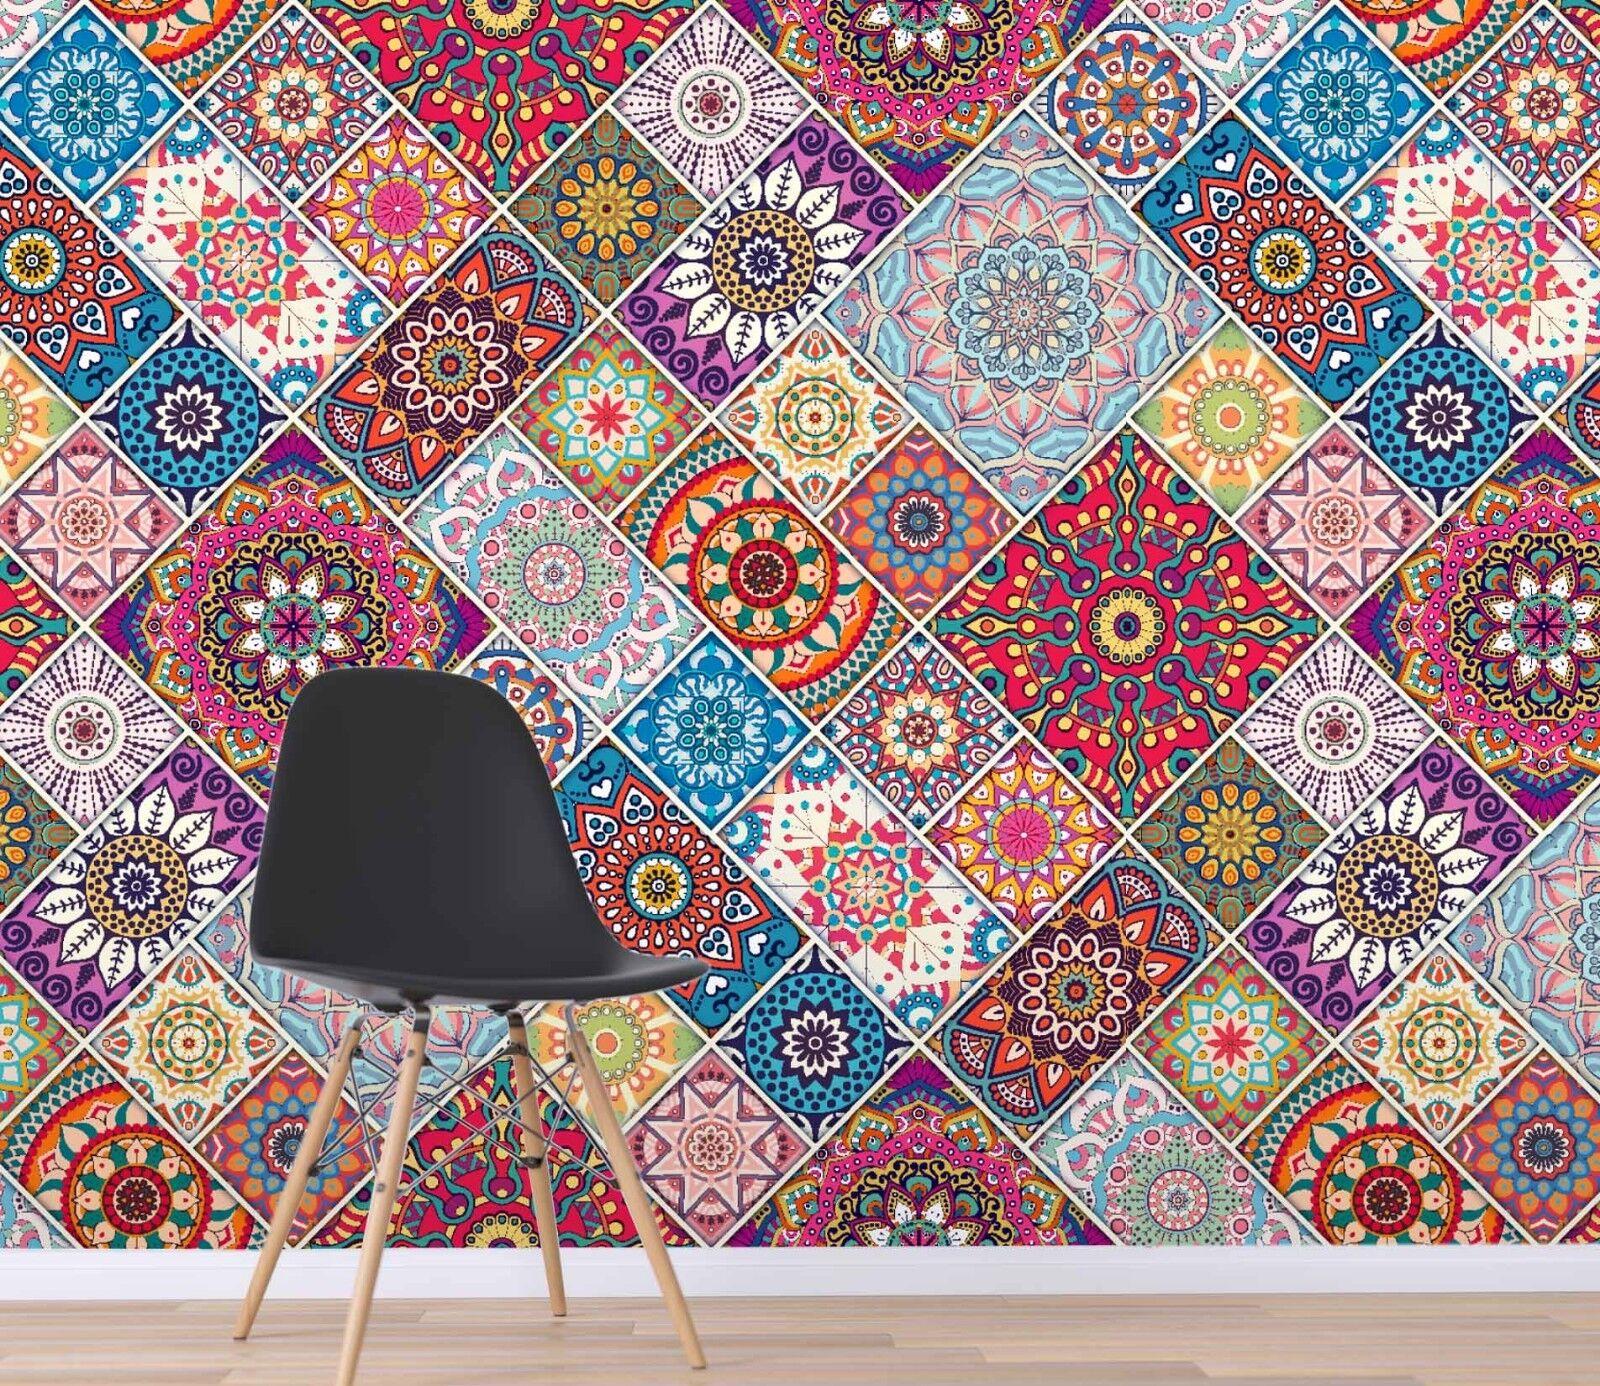 3D Farbeful Pattern 224 Wallpaper Mural Print Wall Indoor Wallpaper Murals UK